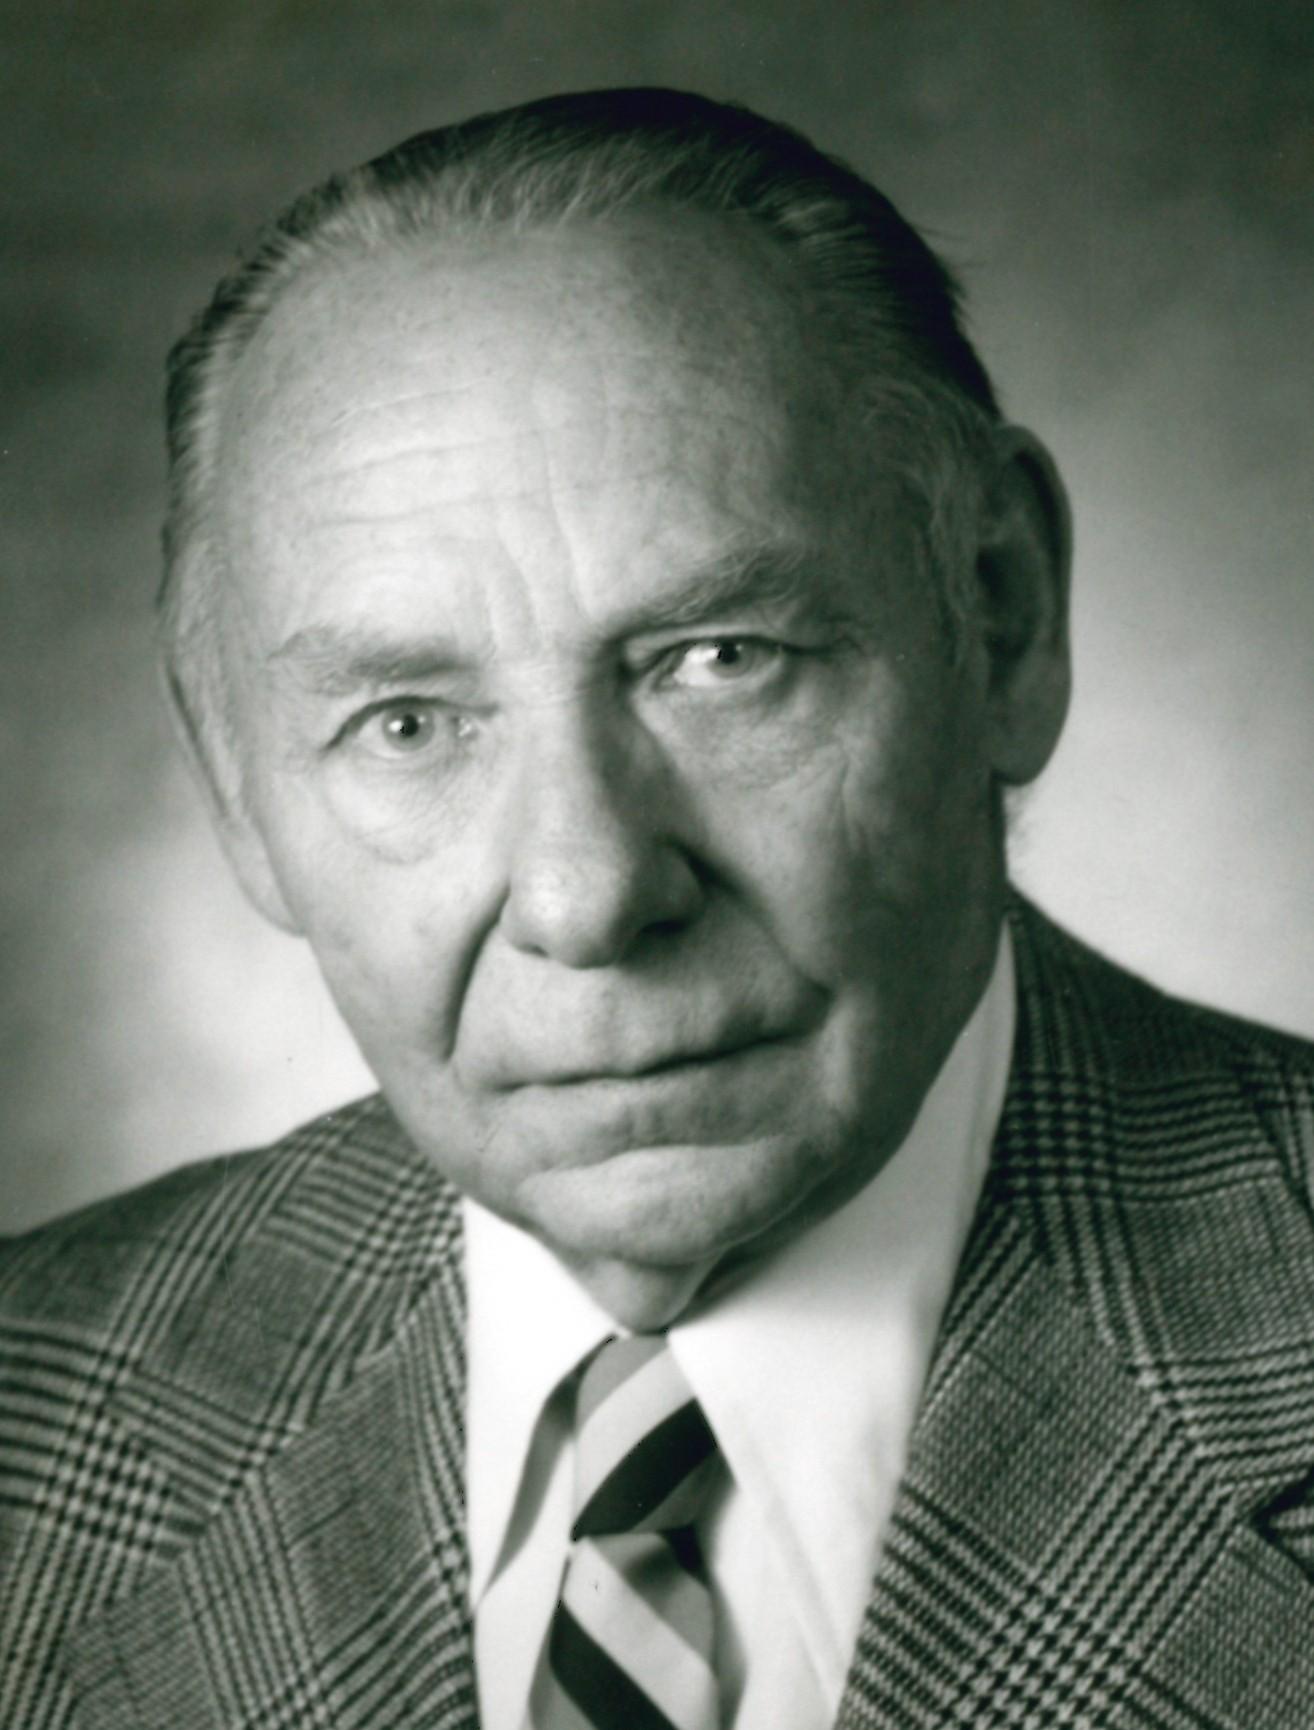 HALL: Dr. Lloyd C. of Lucan